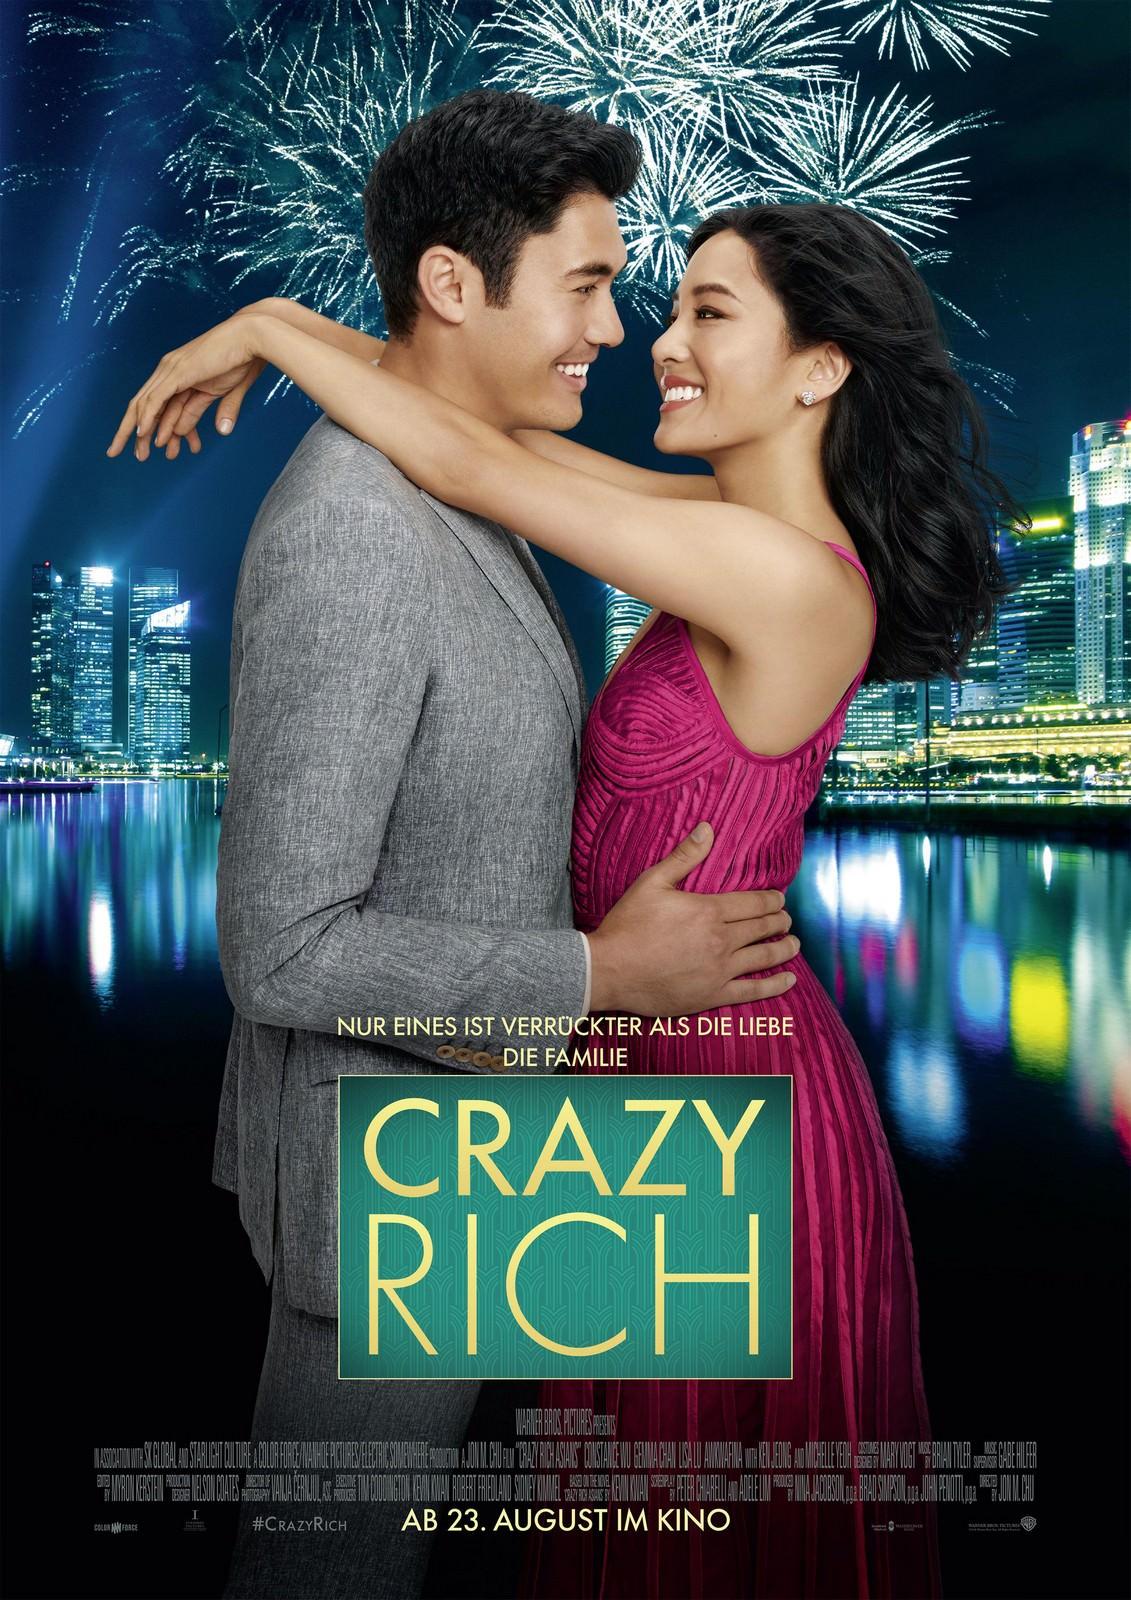 Movie, Crazy Rich Asians(美國, 2018) / 瘋狂亞洲富豪(台) / 我的超豪男友(港) / 摘金奇缘(網), 電影海報, 德國